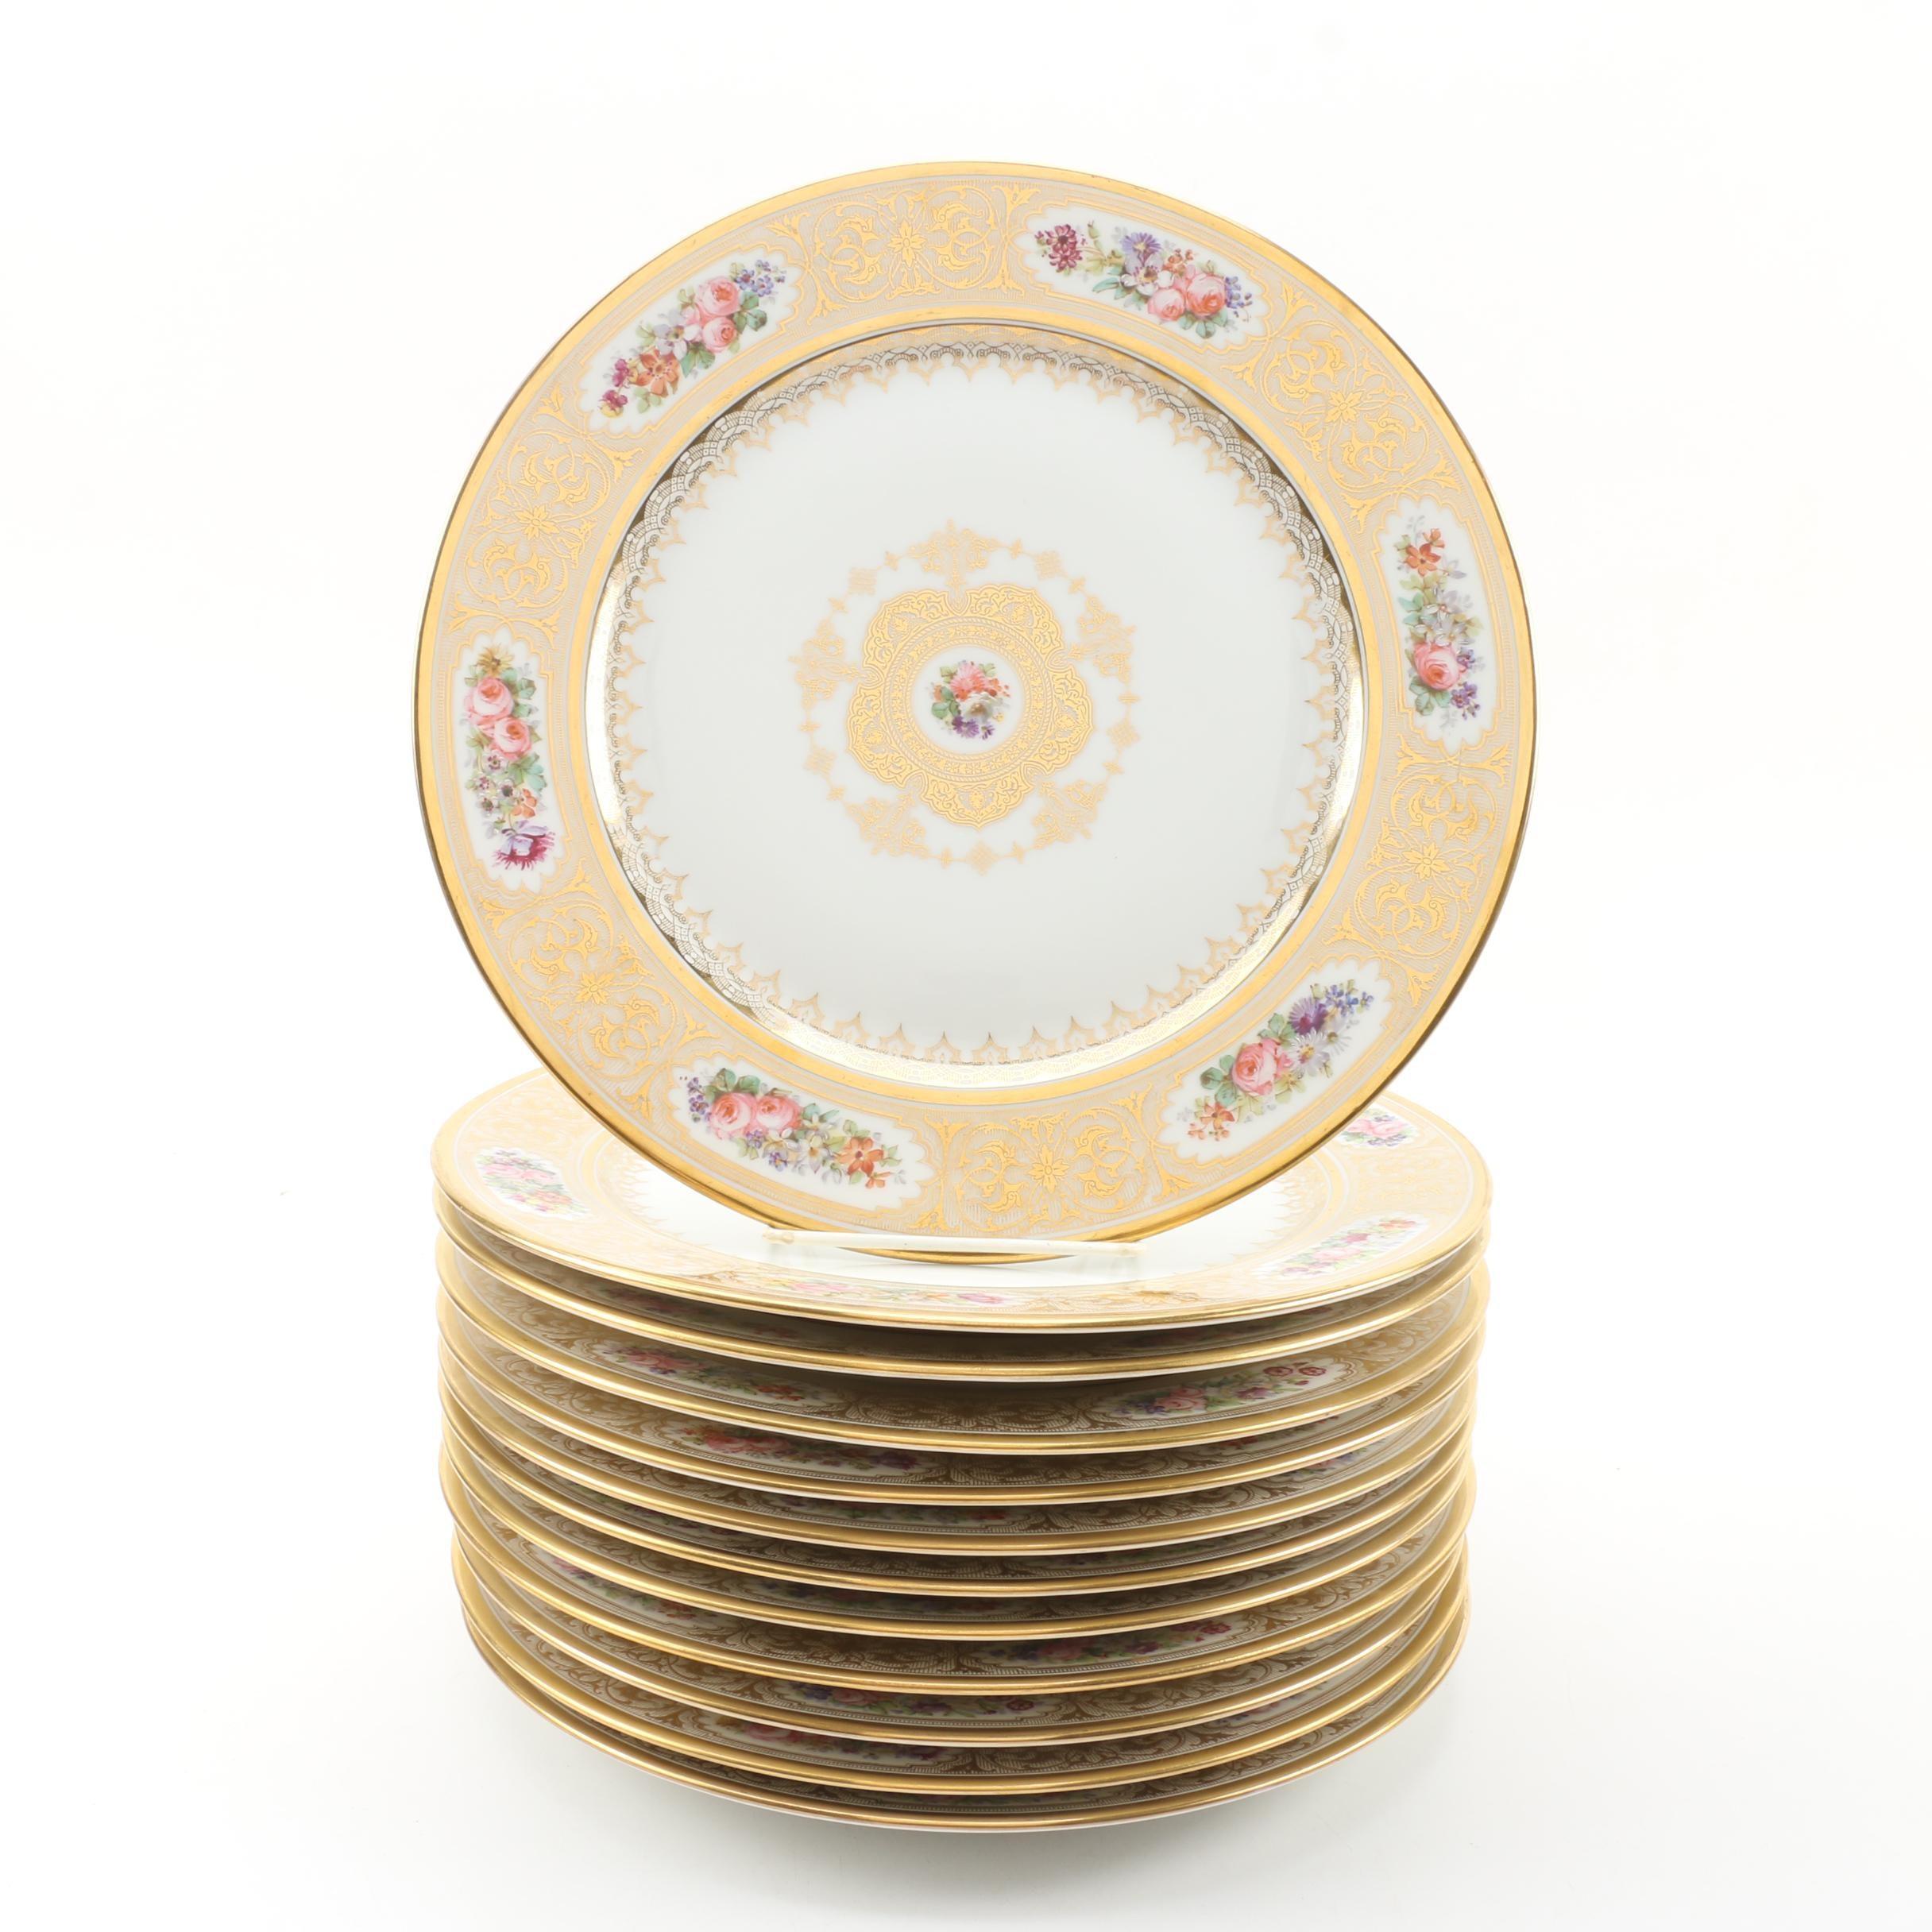 William Guérin & Co. of Limoges Porcelain Dinner Plates, 1900-1932